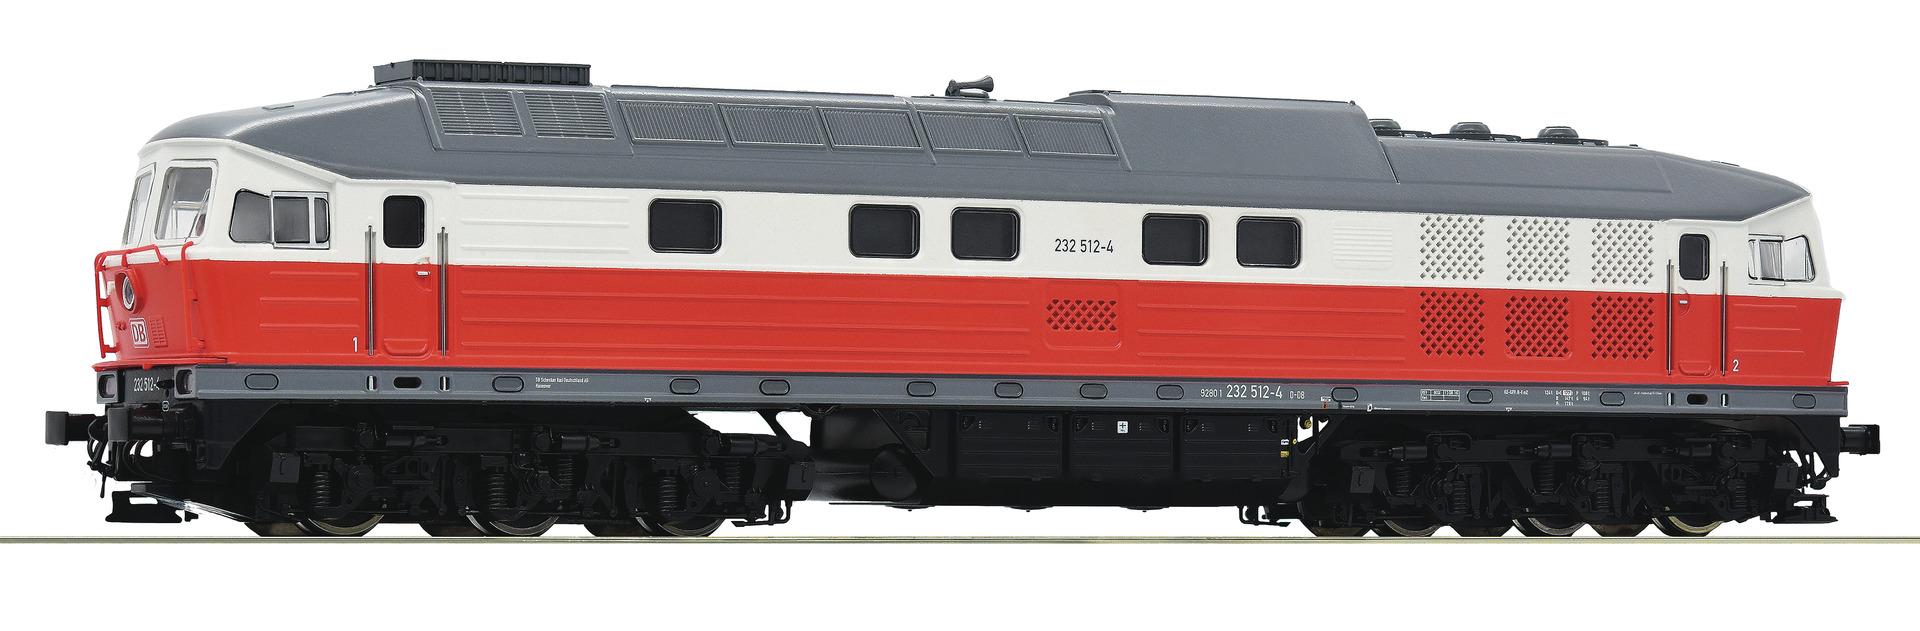 Roco-52504.jpg